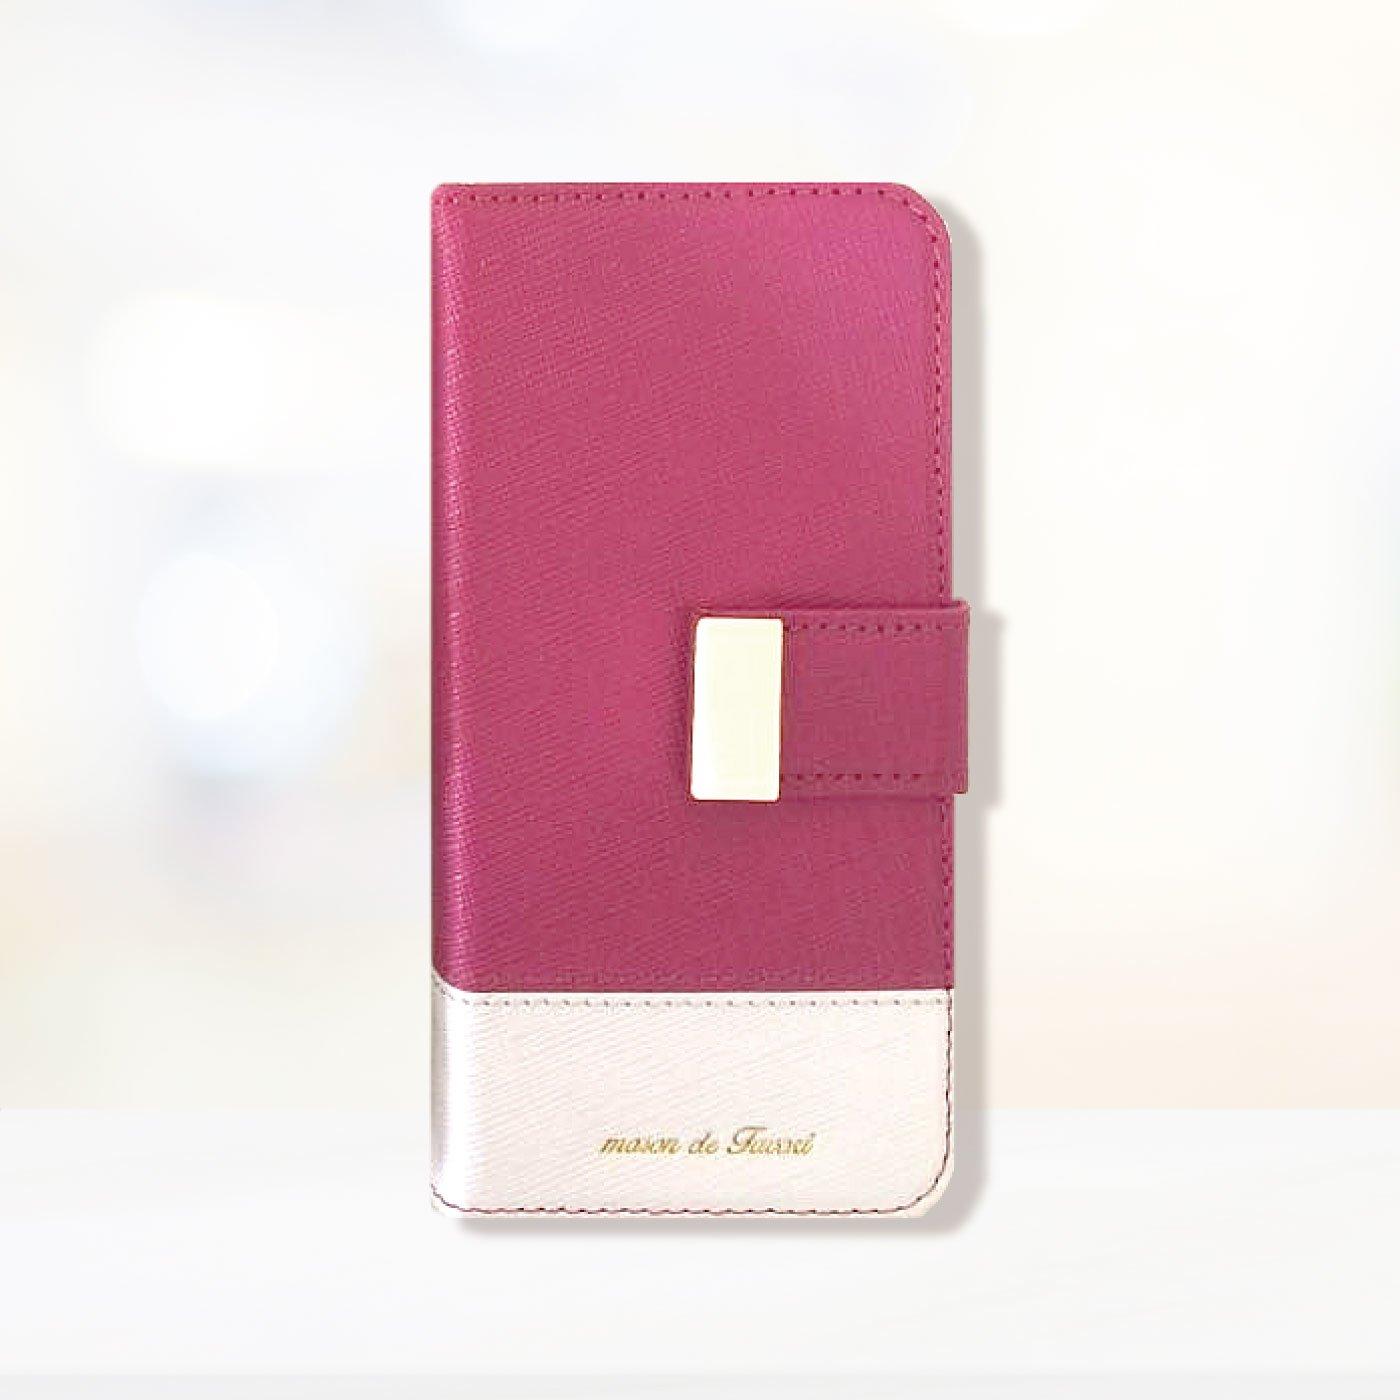 iphone6s/6/7/8 手帳型スマホカバー 2トーンベーシック